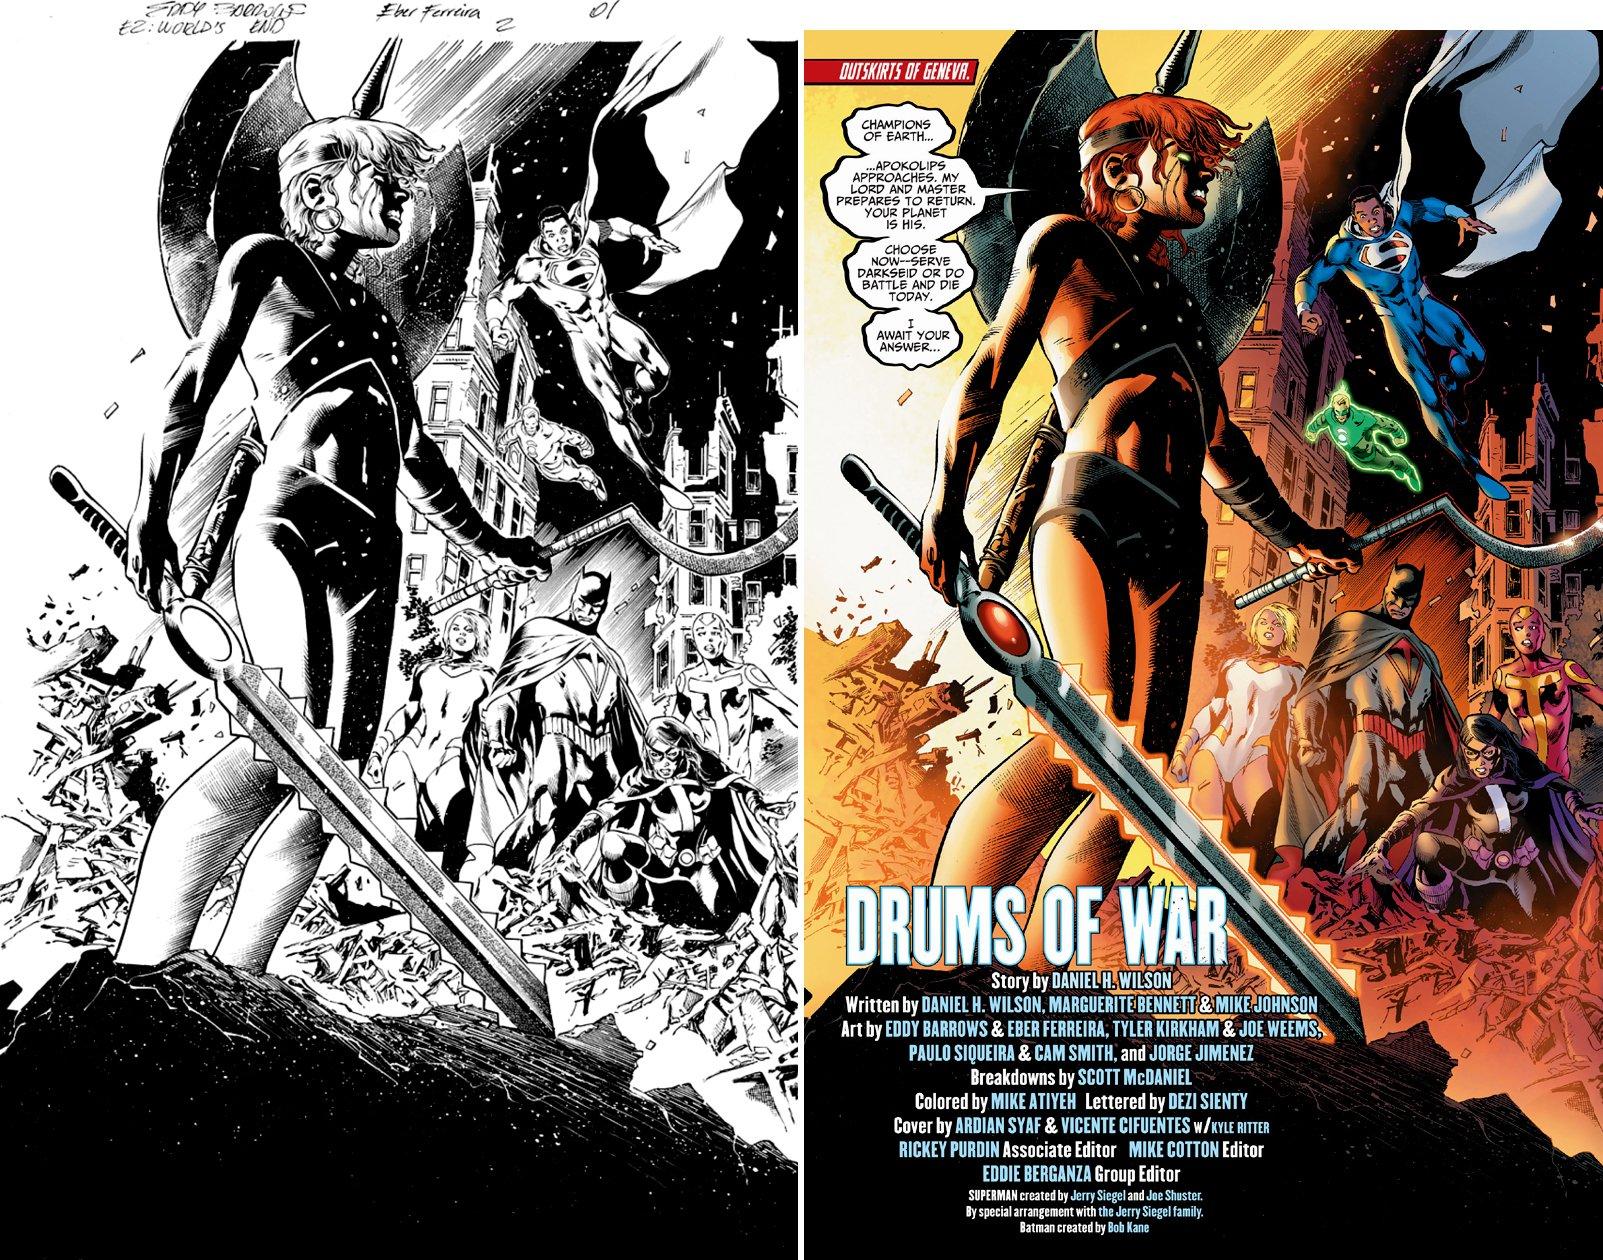 Earth 2: World's End #2 p 1 SPLASH (Superman, Power Girl, Huntress, Batman, Red Tornado, Green Lantern Battle K'li) 2014